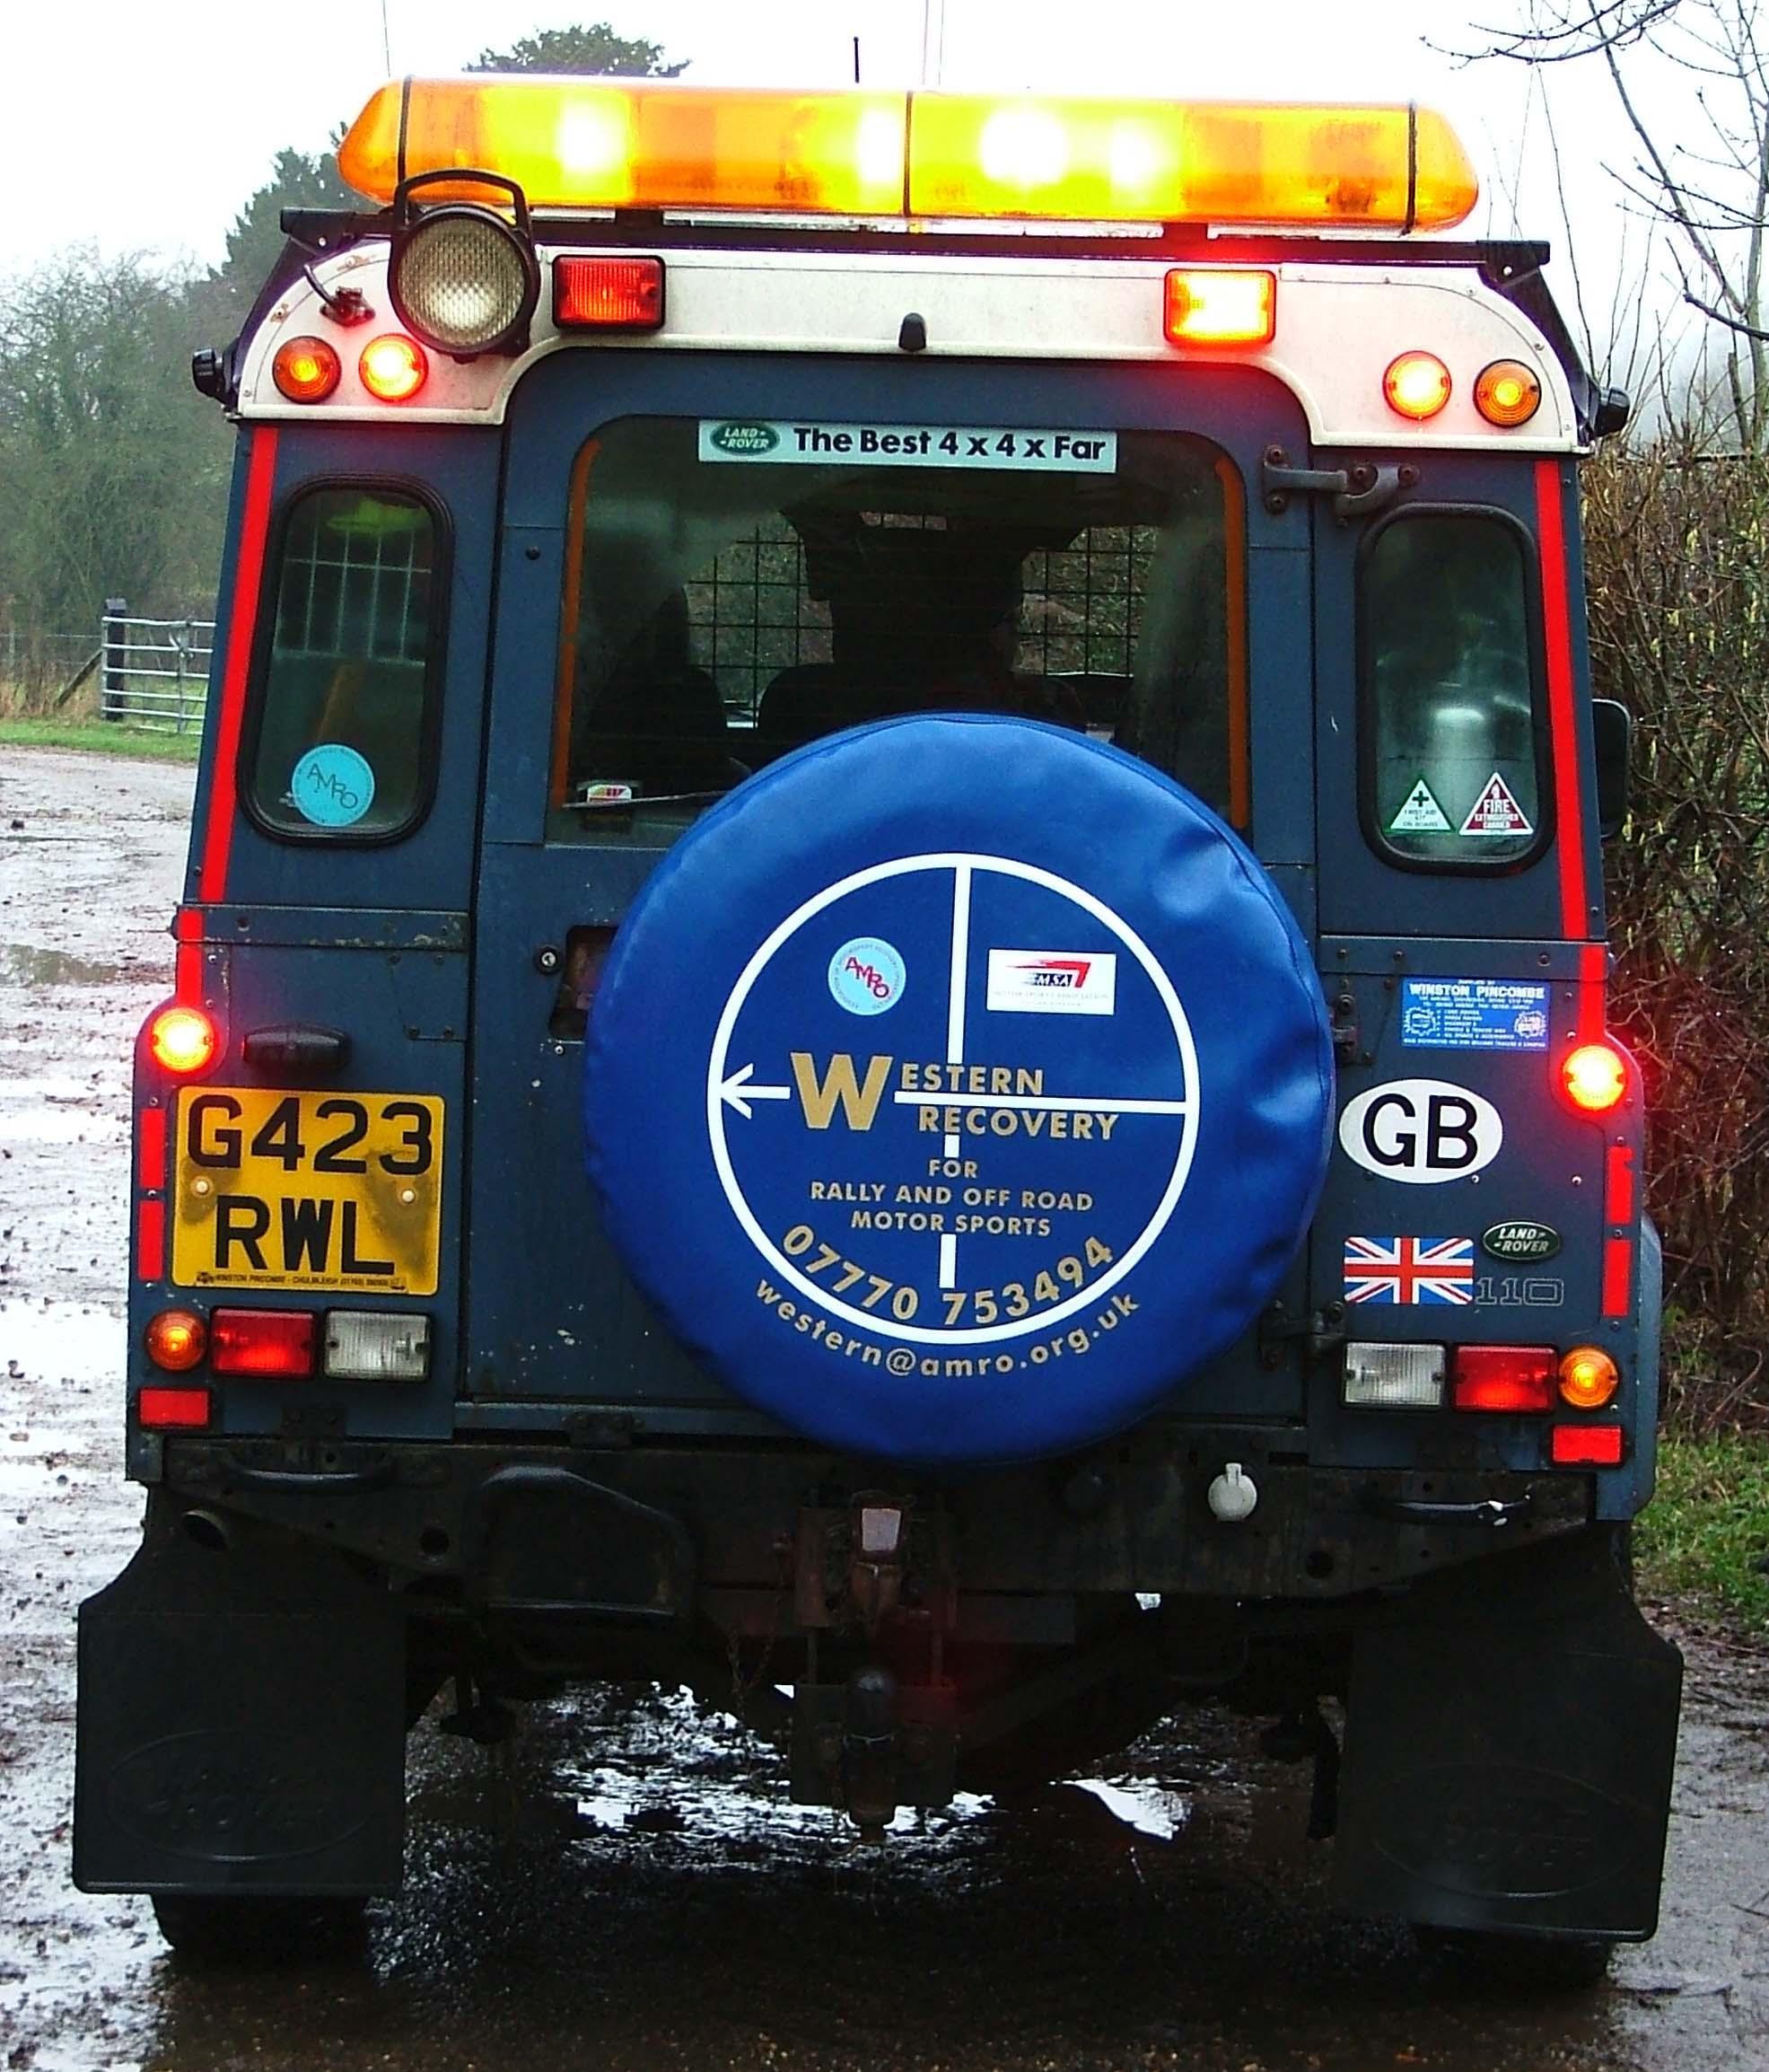 Genuine Defender Worklight Forum Lr4x4 The Land Rover Lights Post 20 1228937558 Thumb